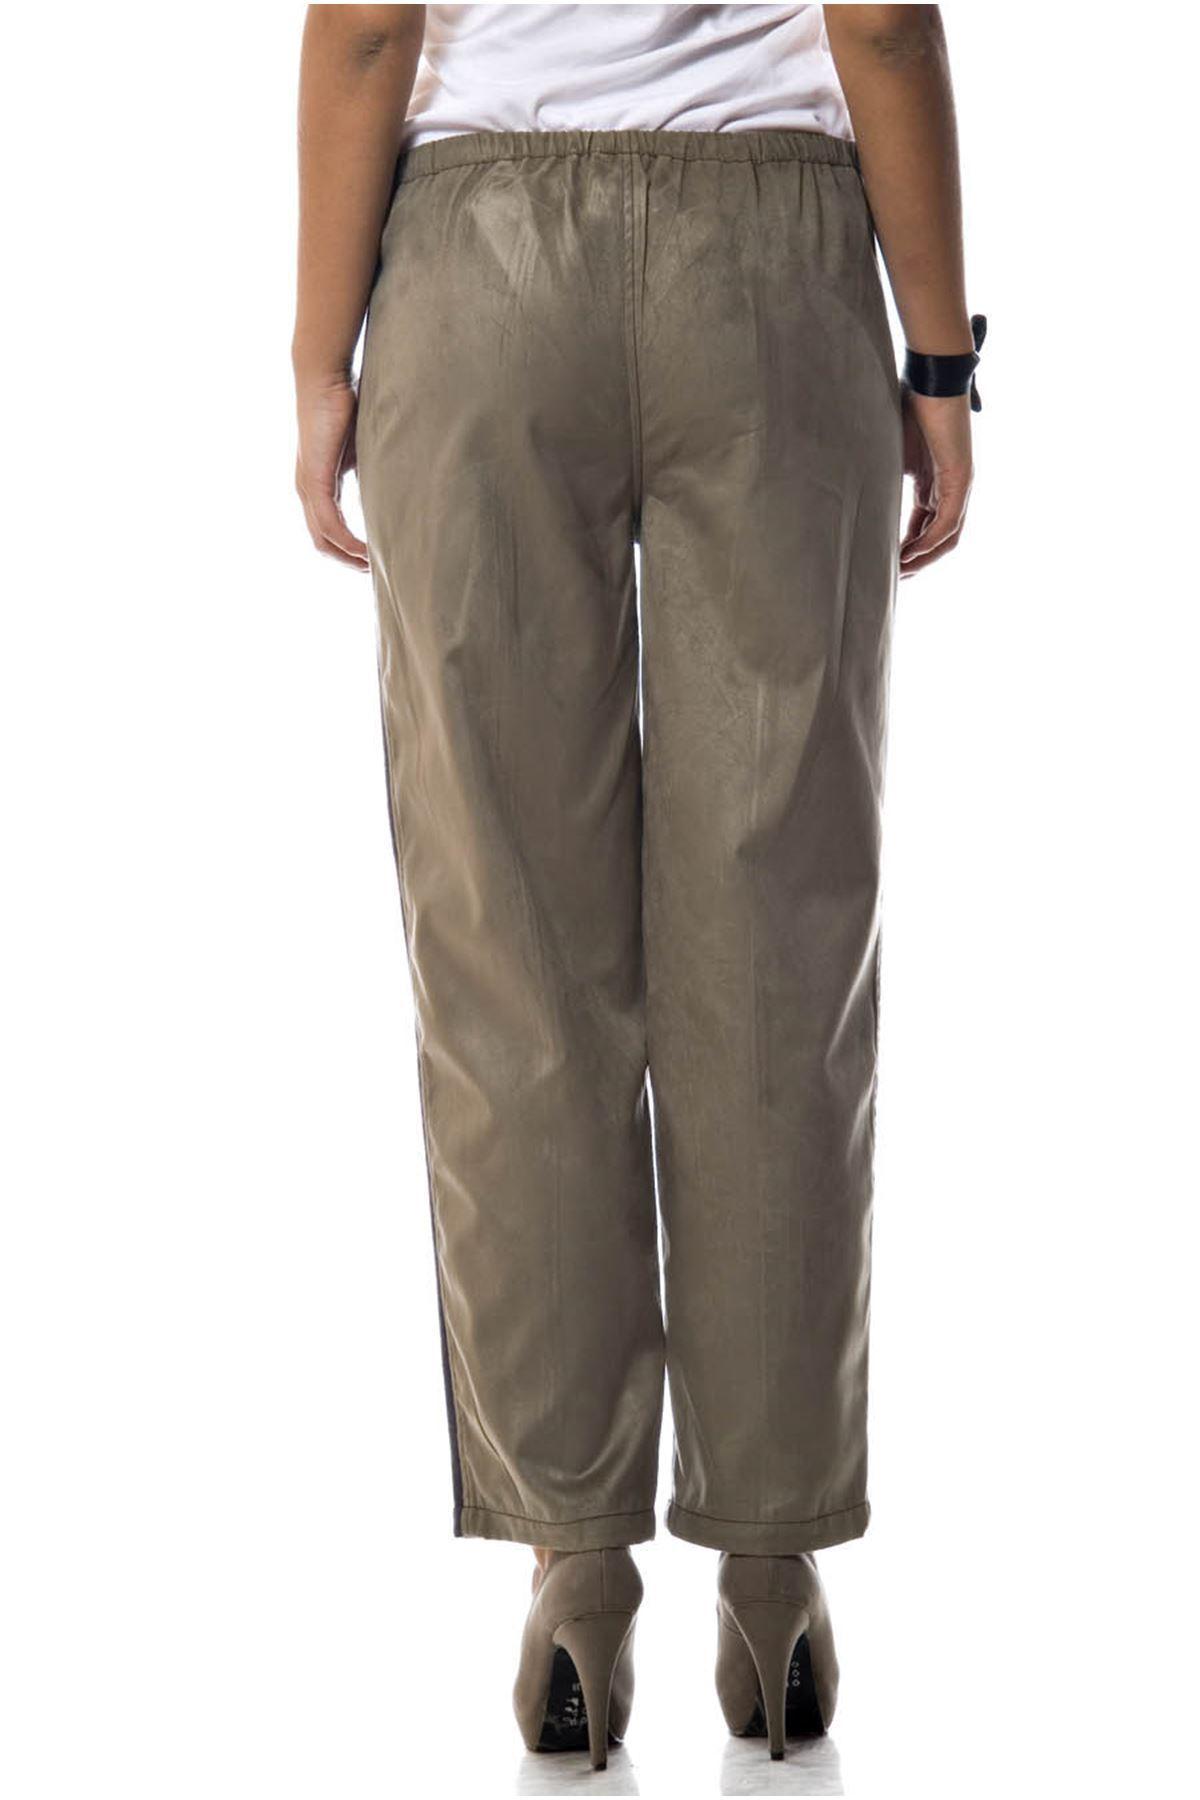 Şeritli Çift Renk Pantolon 1A-52676